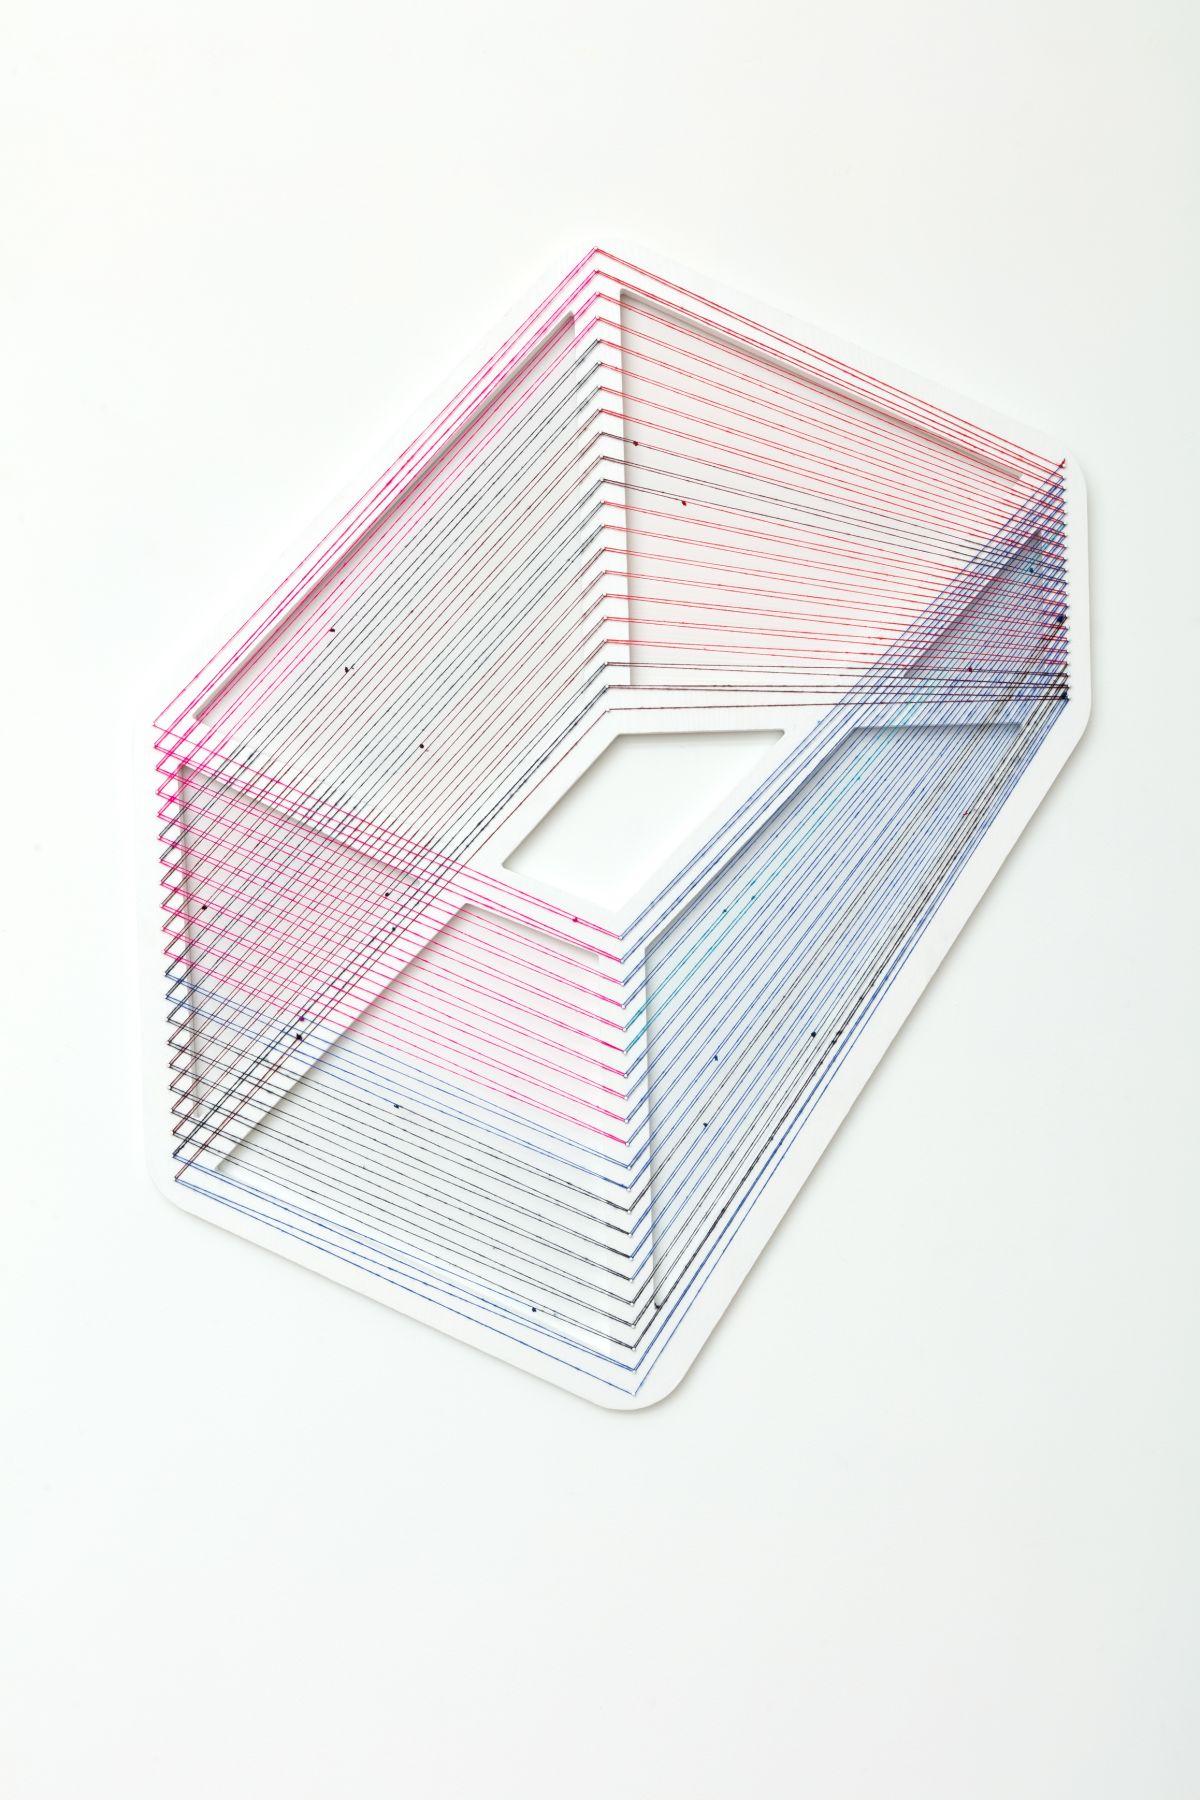 Adrian Esparza, Container, 2019